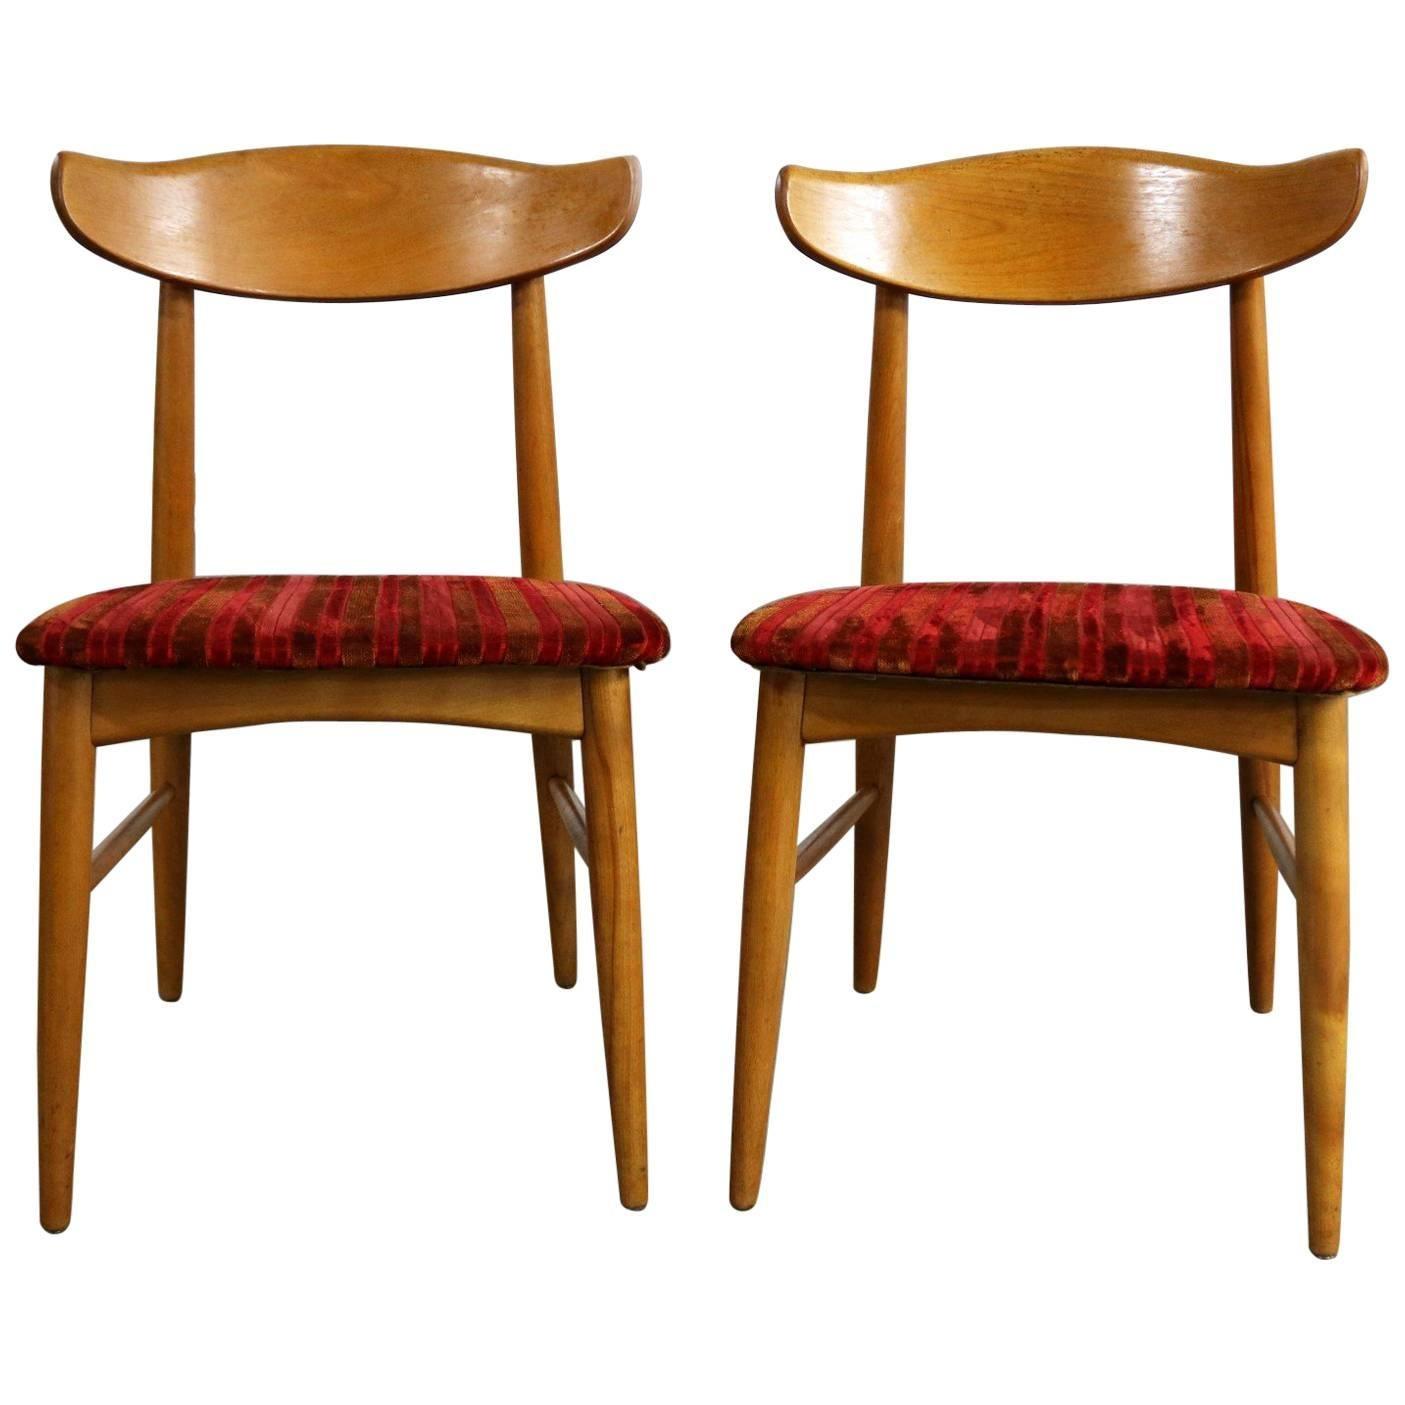 Pair of Mid-Century Modern Birchcraft Danish Style Side Chairs by Baumritter